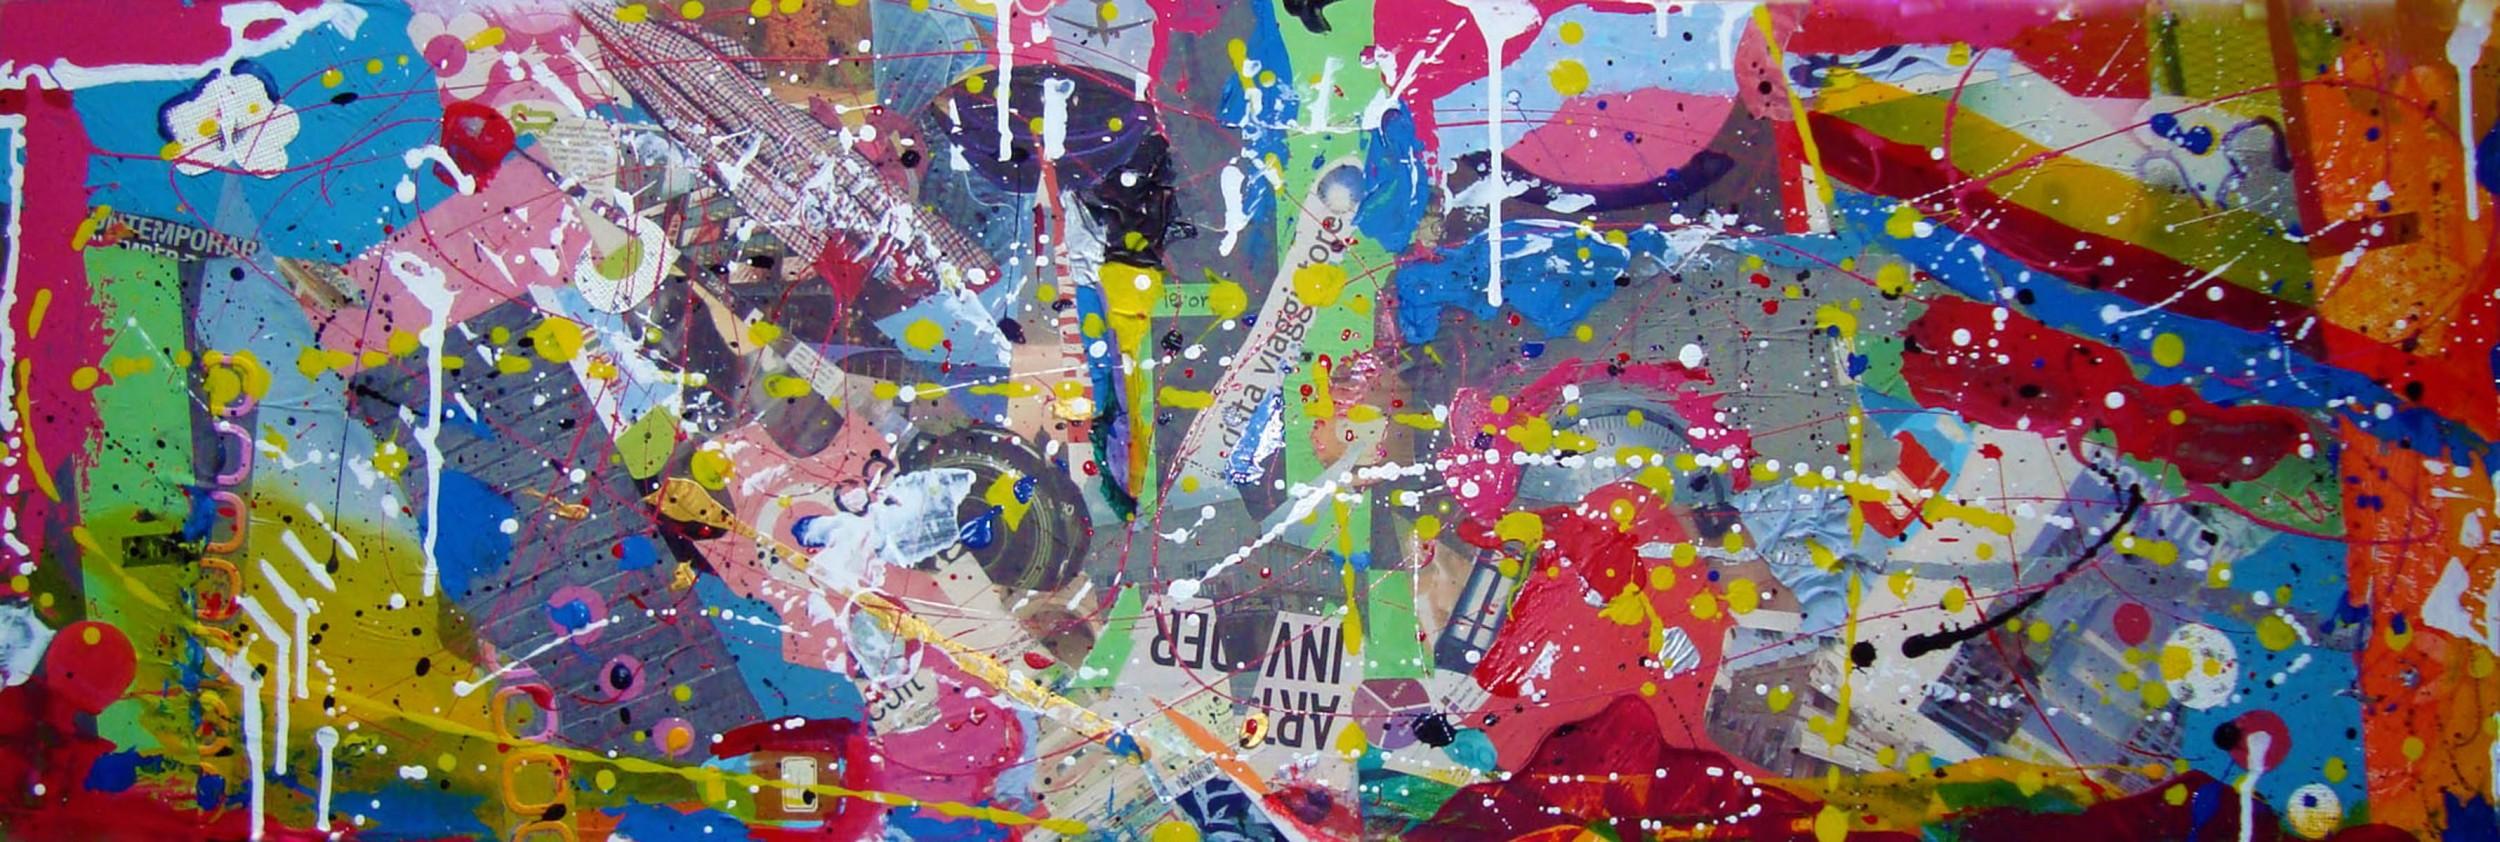 GlobaL MarkeT  JP Funk ART Project  Artwork Celeste Network